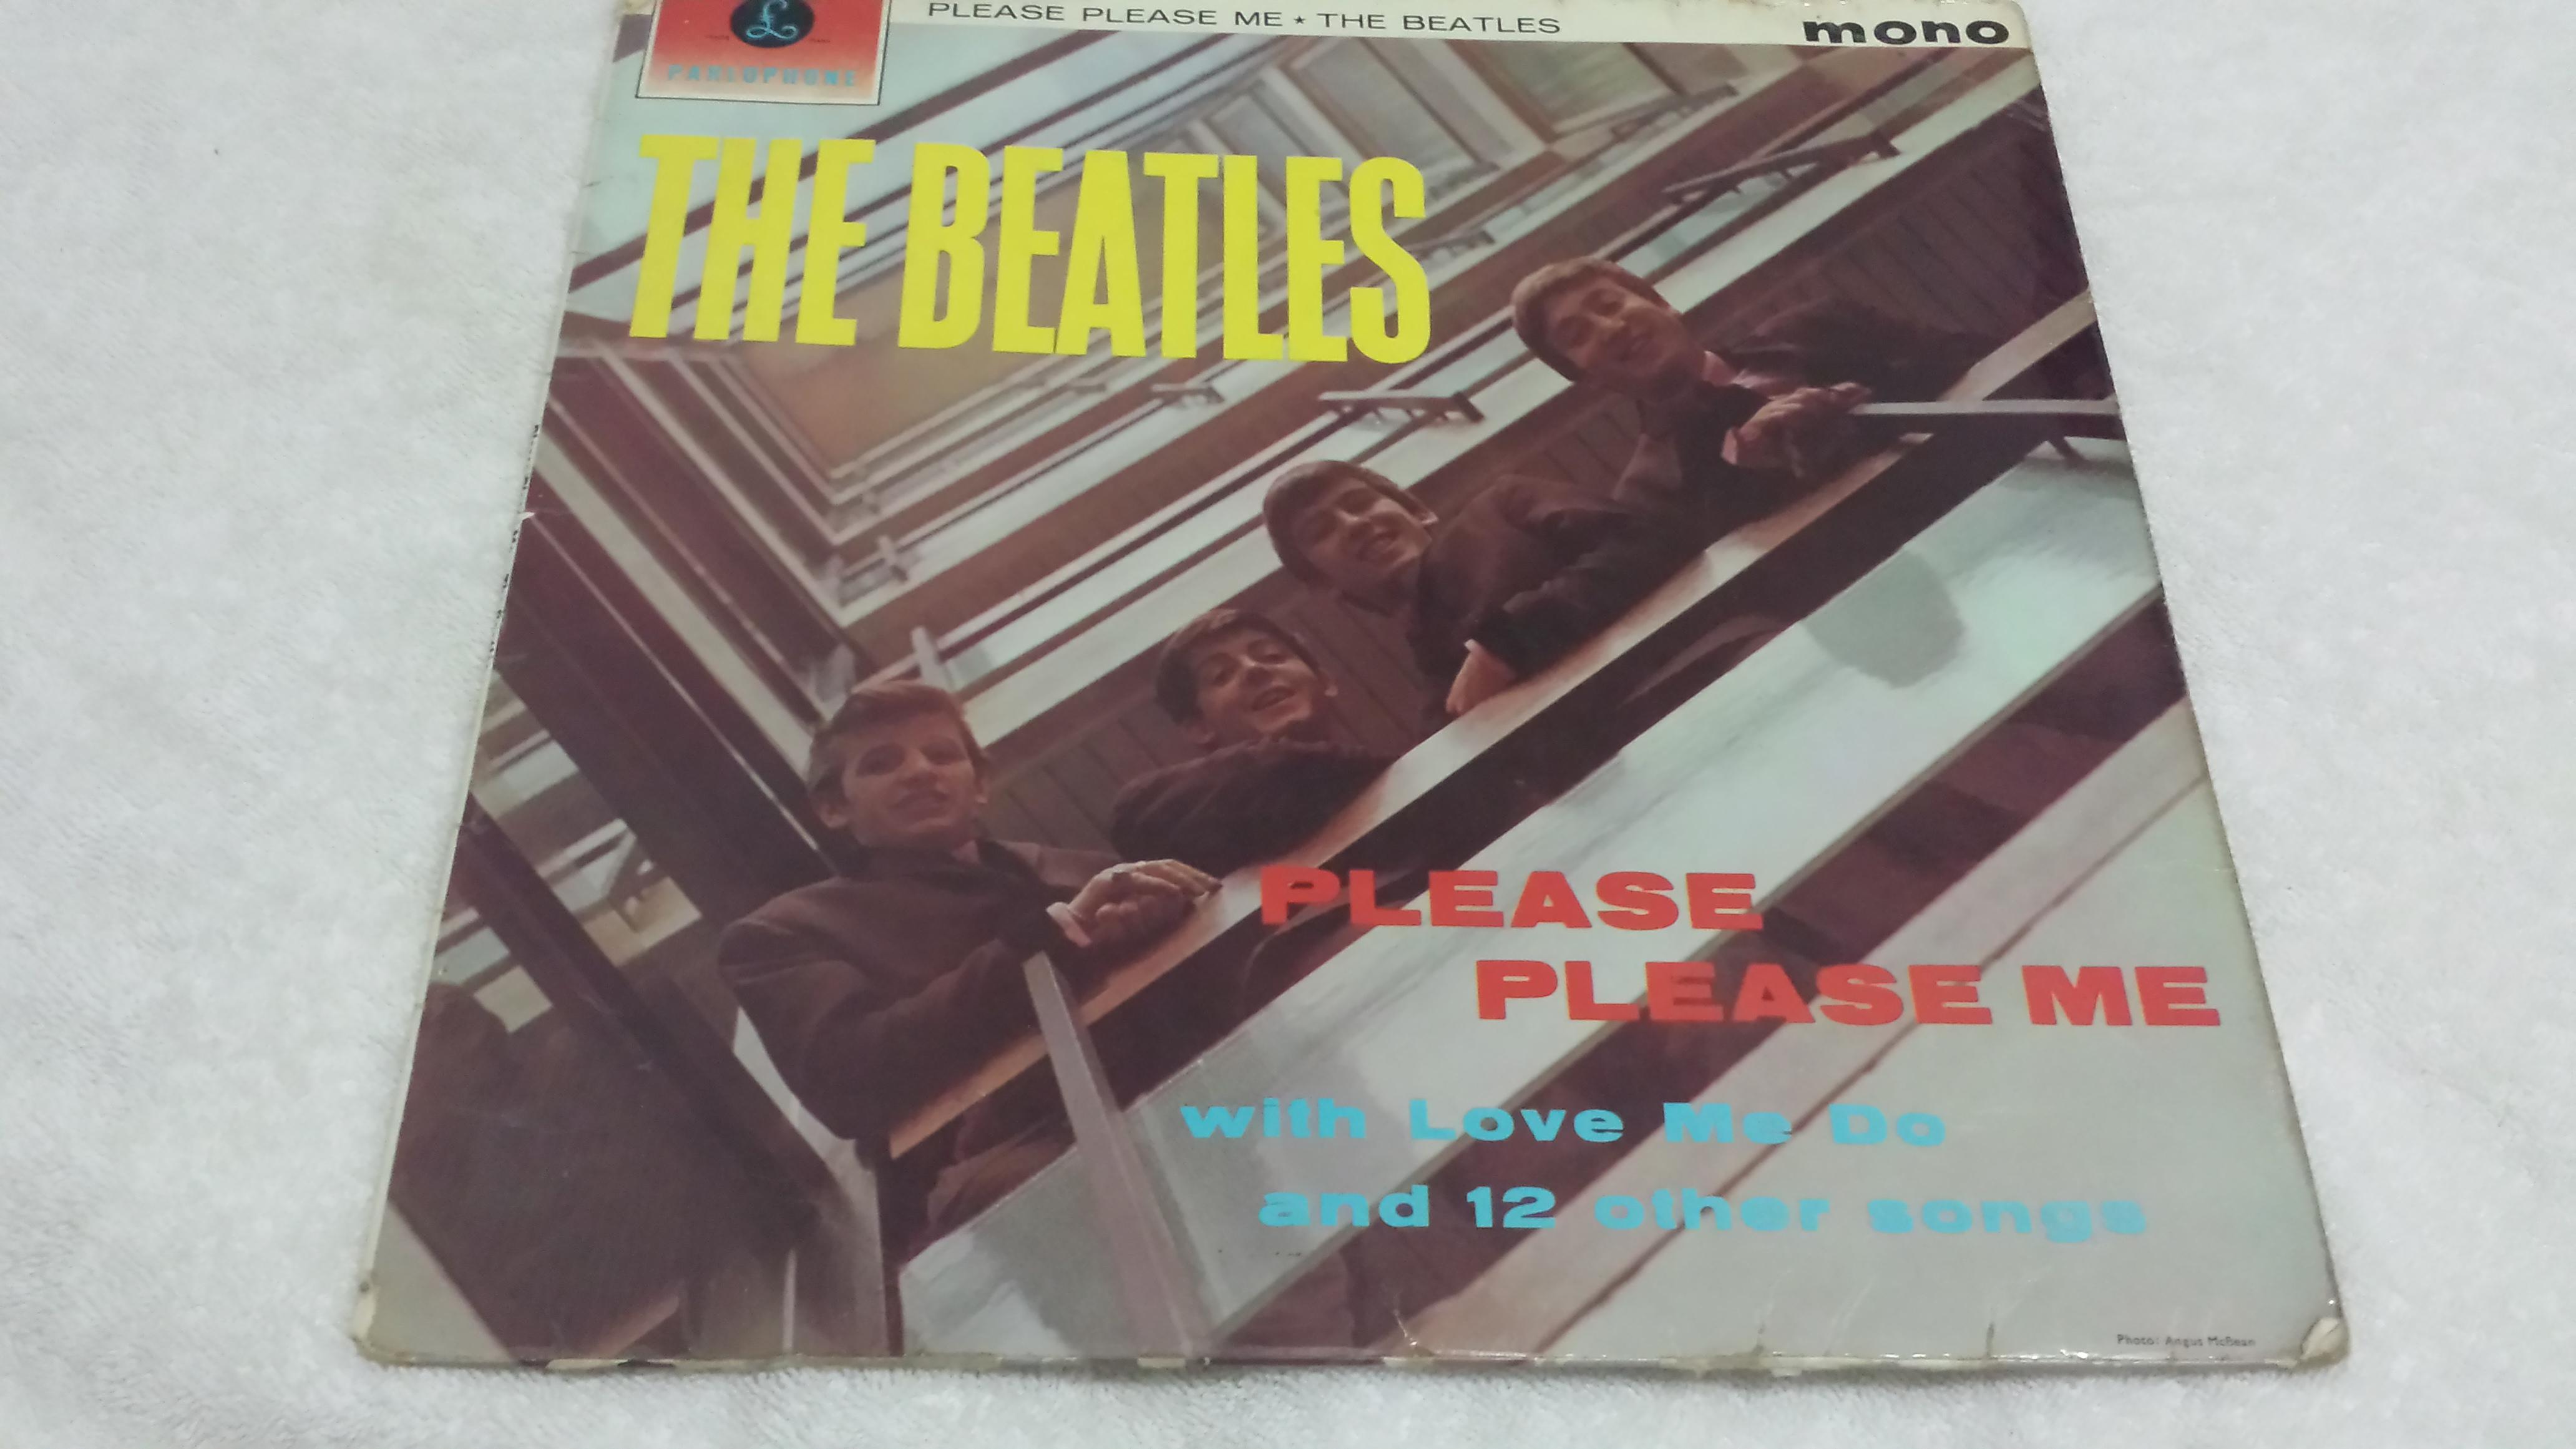 The Beatles, Please Please Me, Mono Vinyl LP, Parlophone – PMC 1202, 1963  UK, Rare* - slowrockingbro